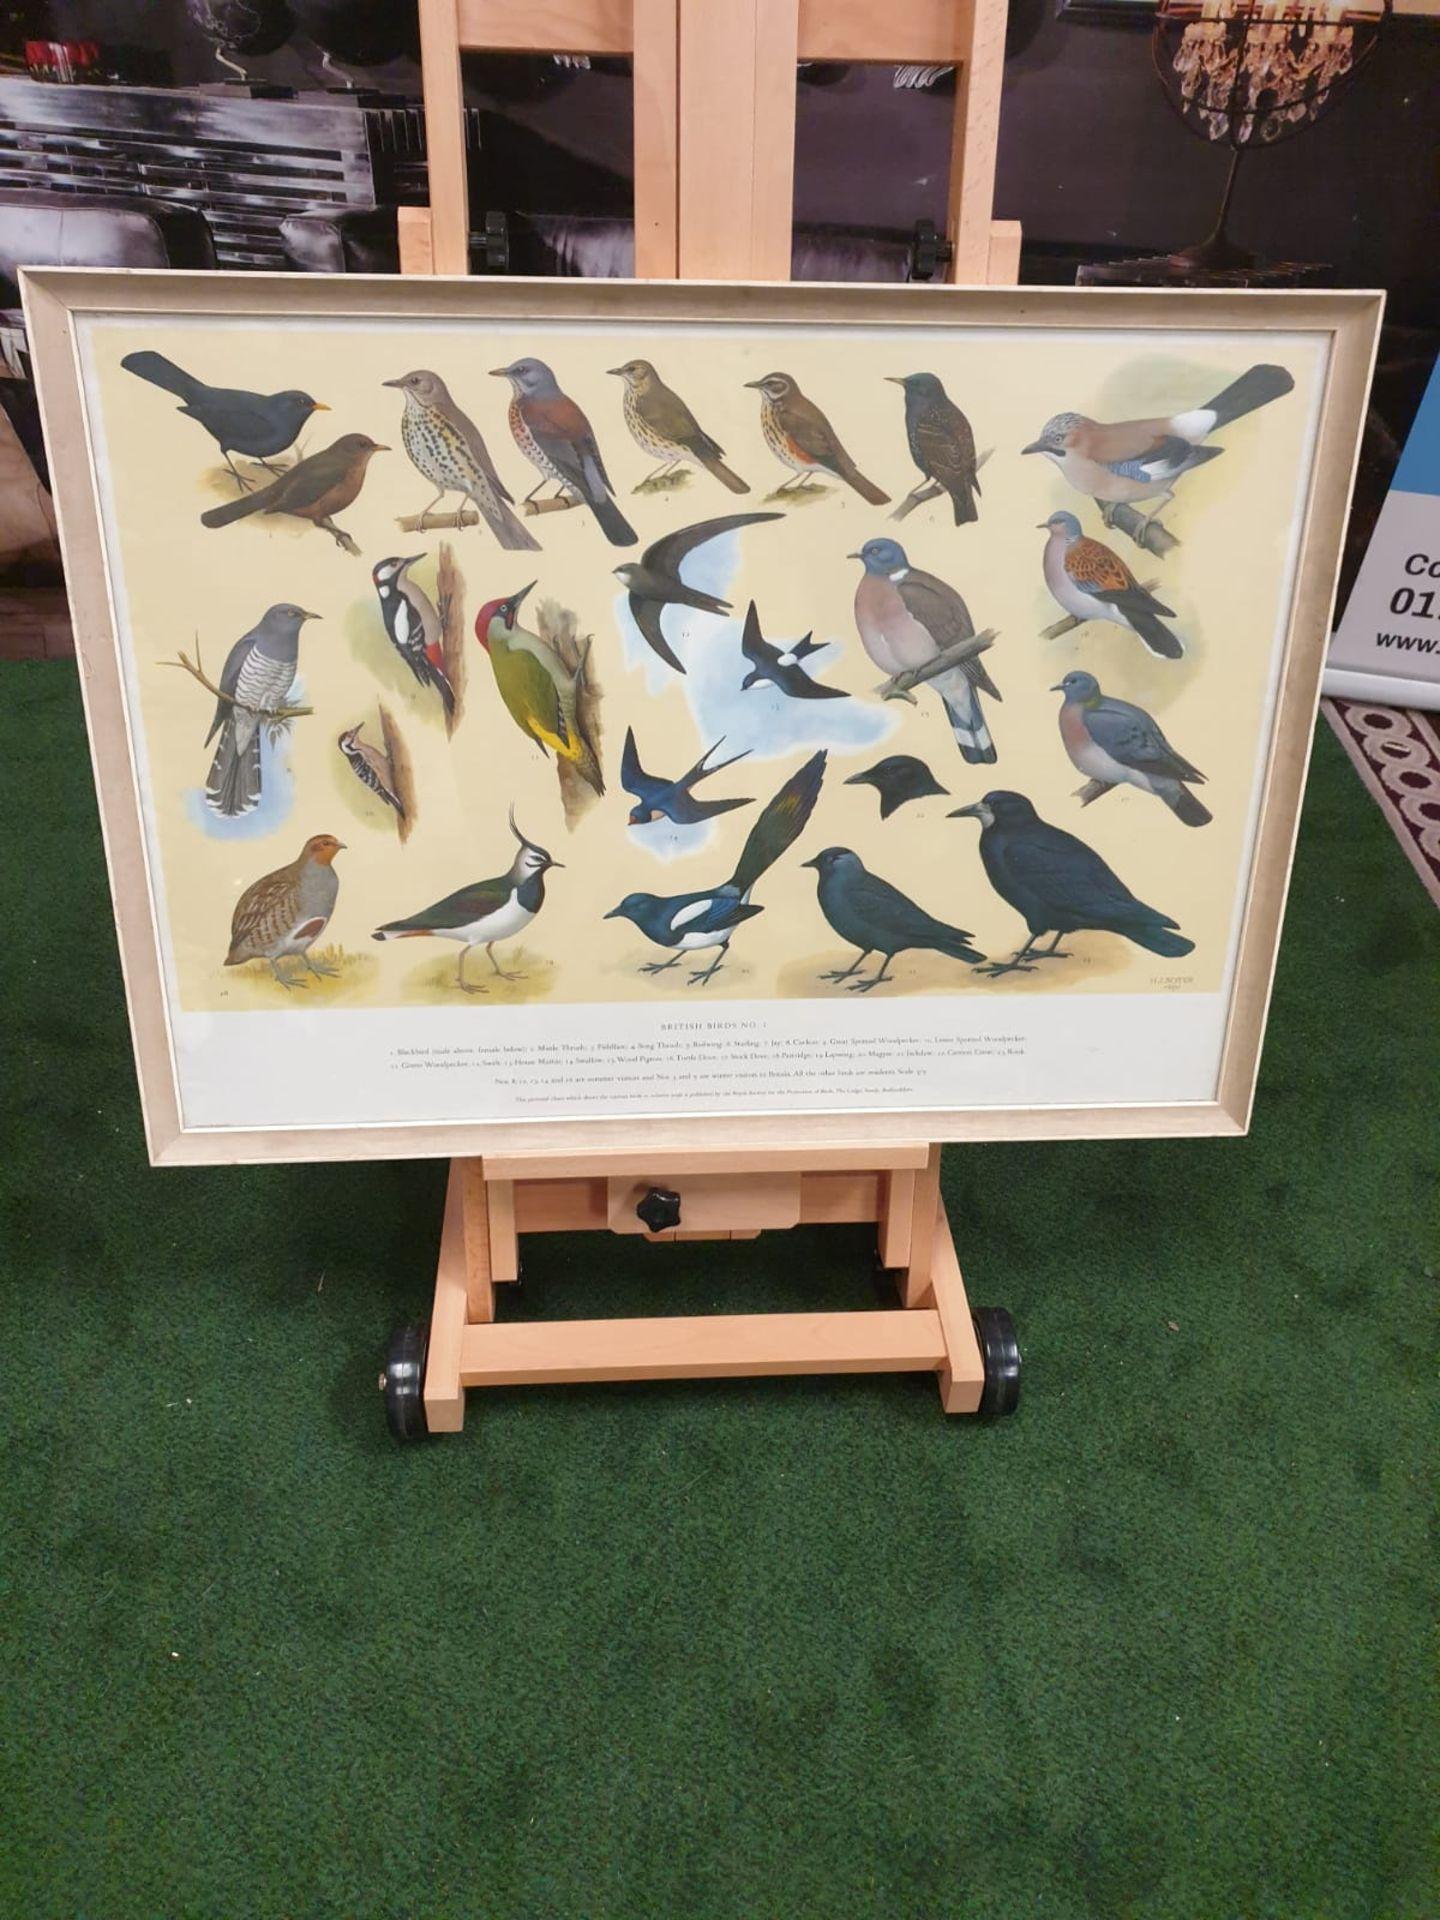 A set of 5 framed series 1 – 5 coloured prints pictorial charts RSPB on British Birds H J Slyper - Image 7 of 7